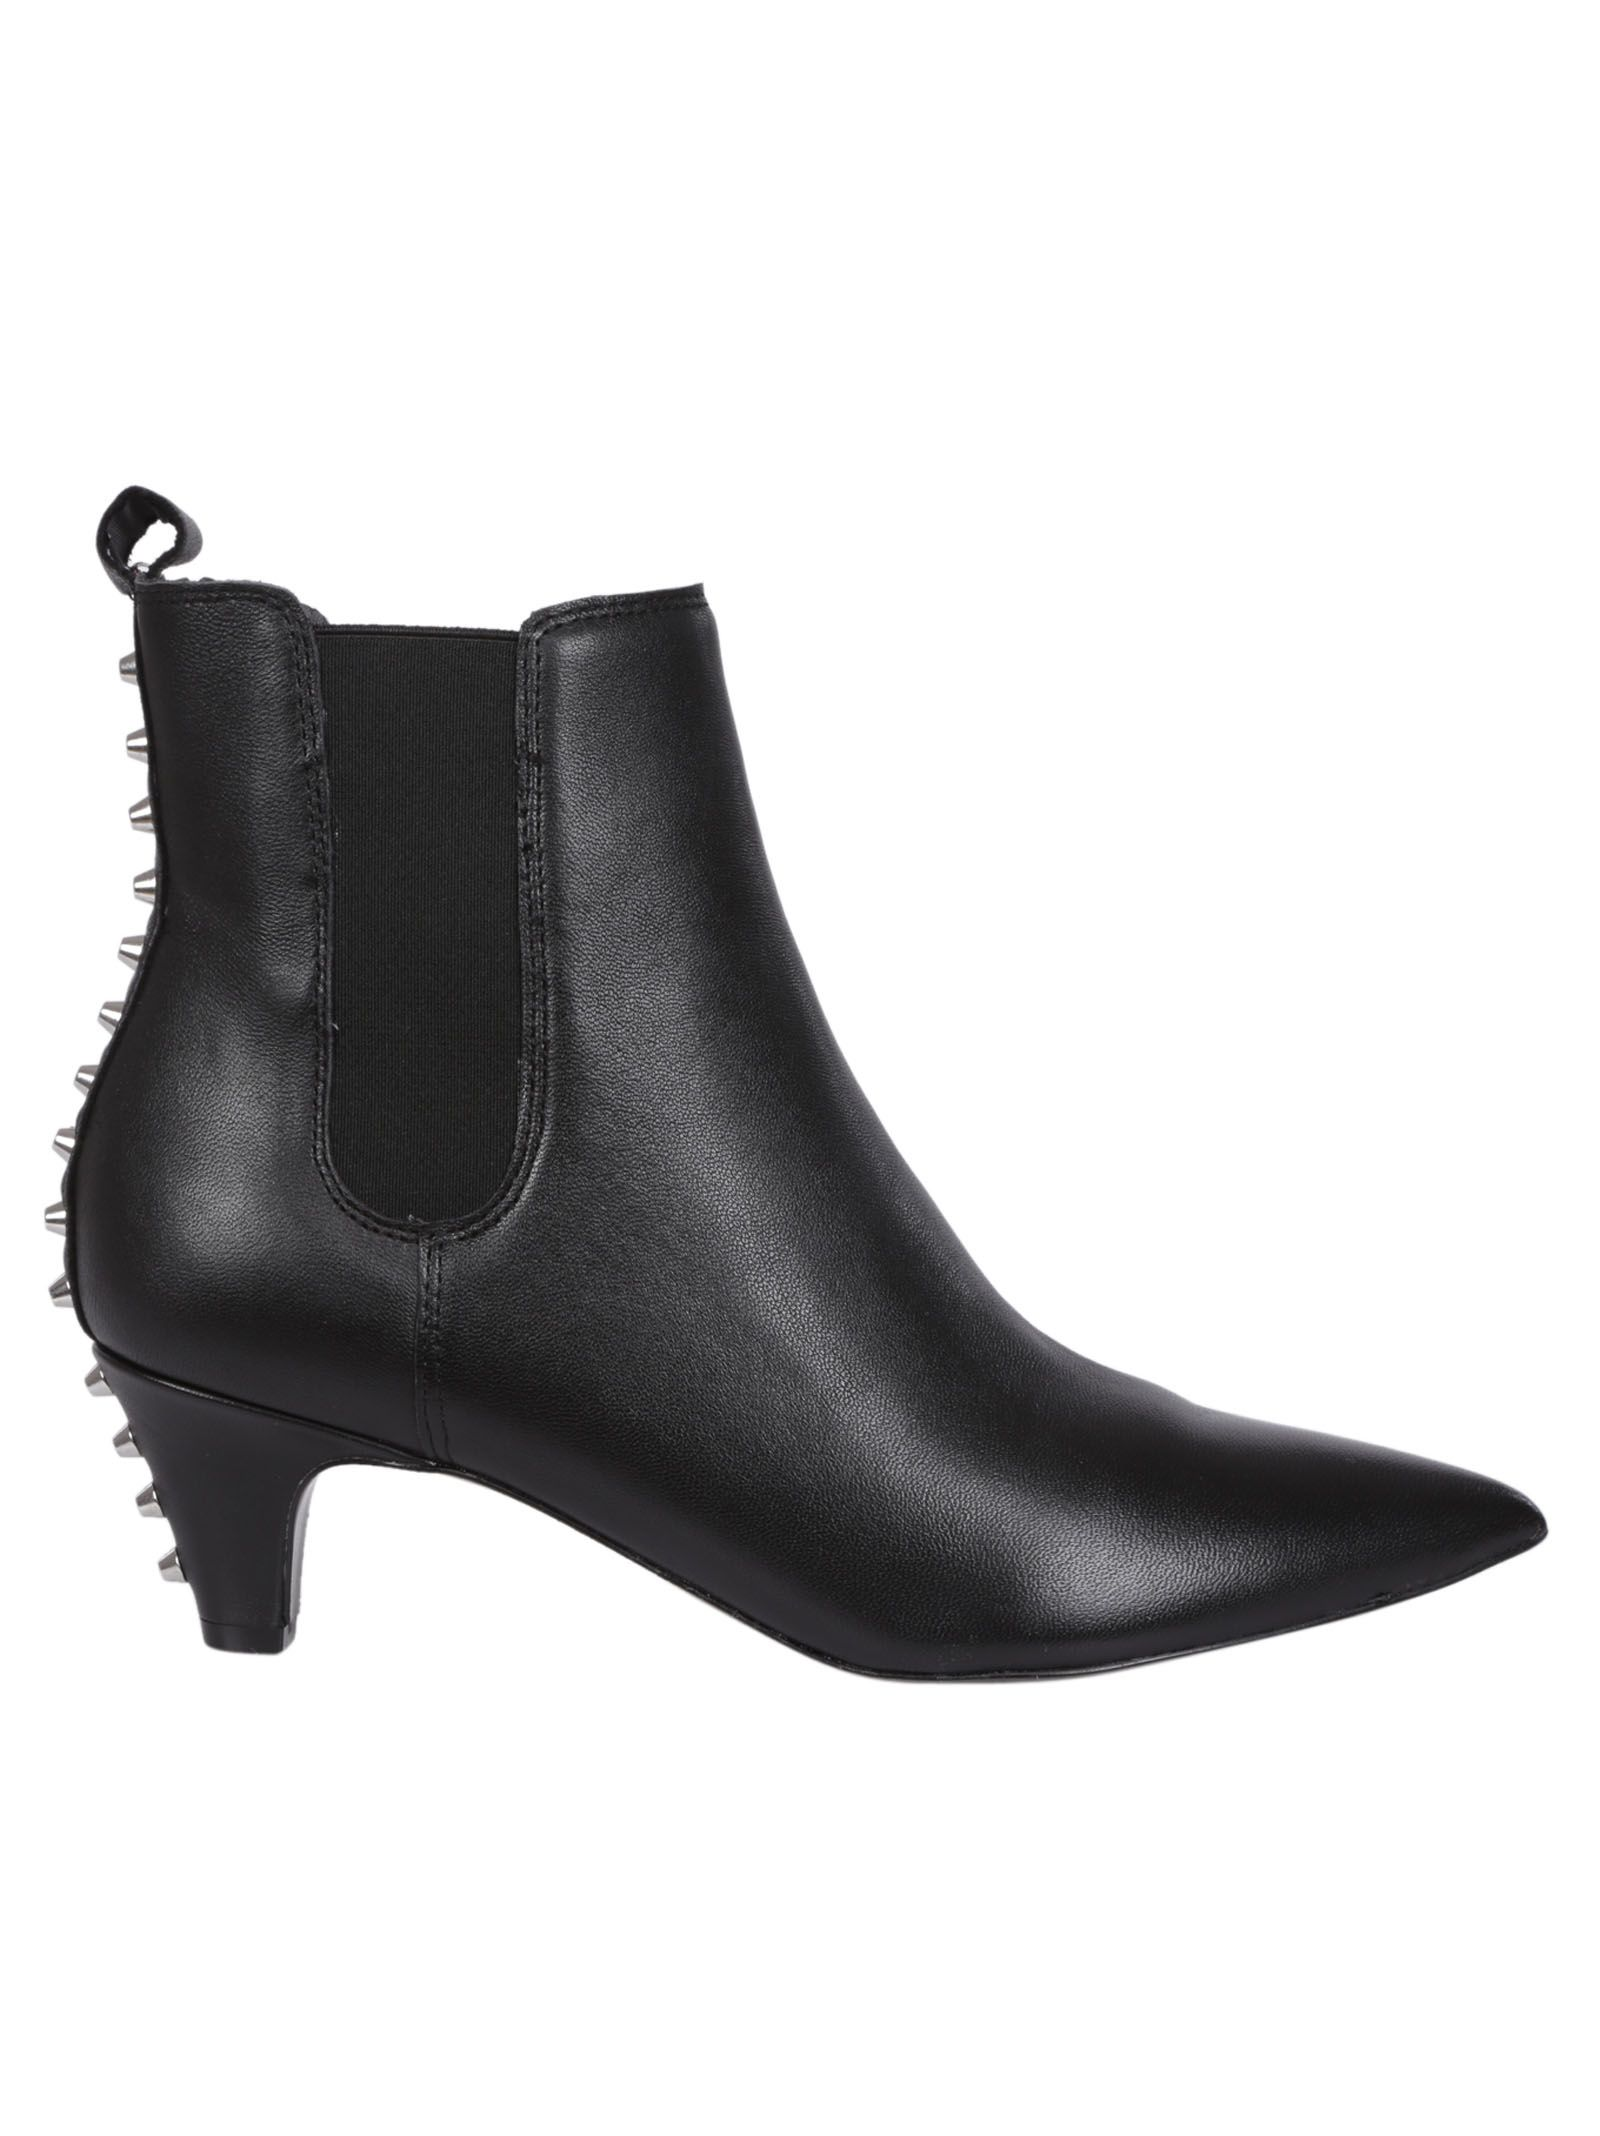 Kendall + Kylie Kkpierce 3 Ankle Boots